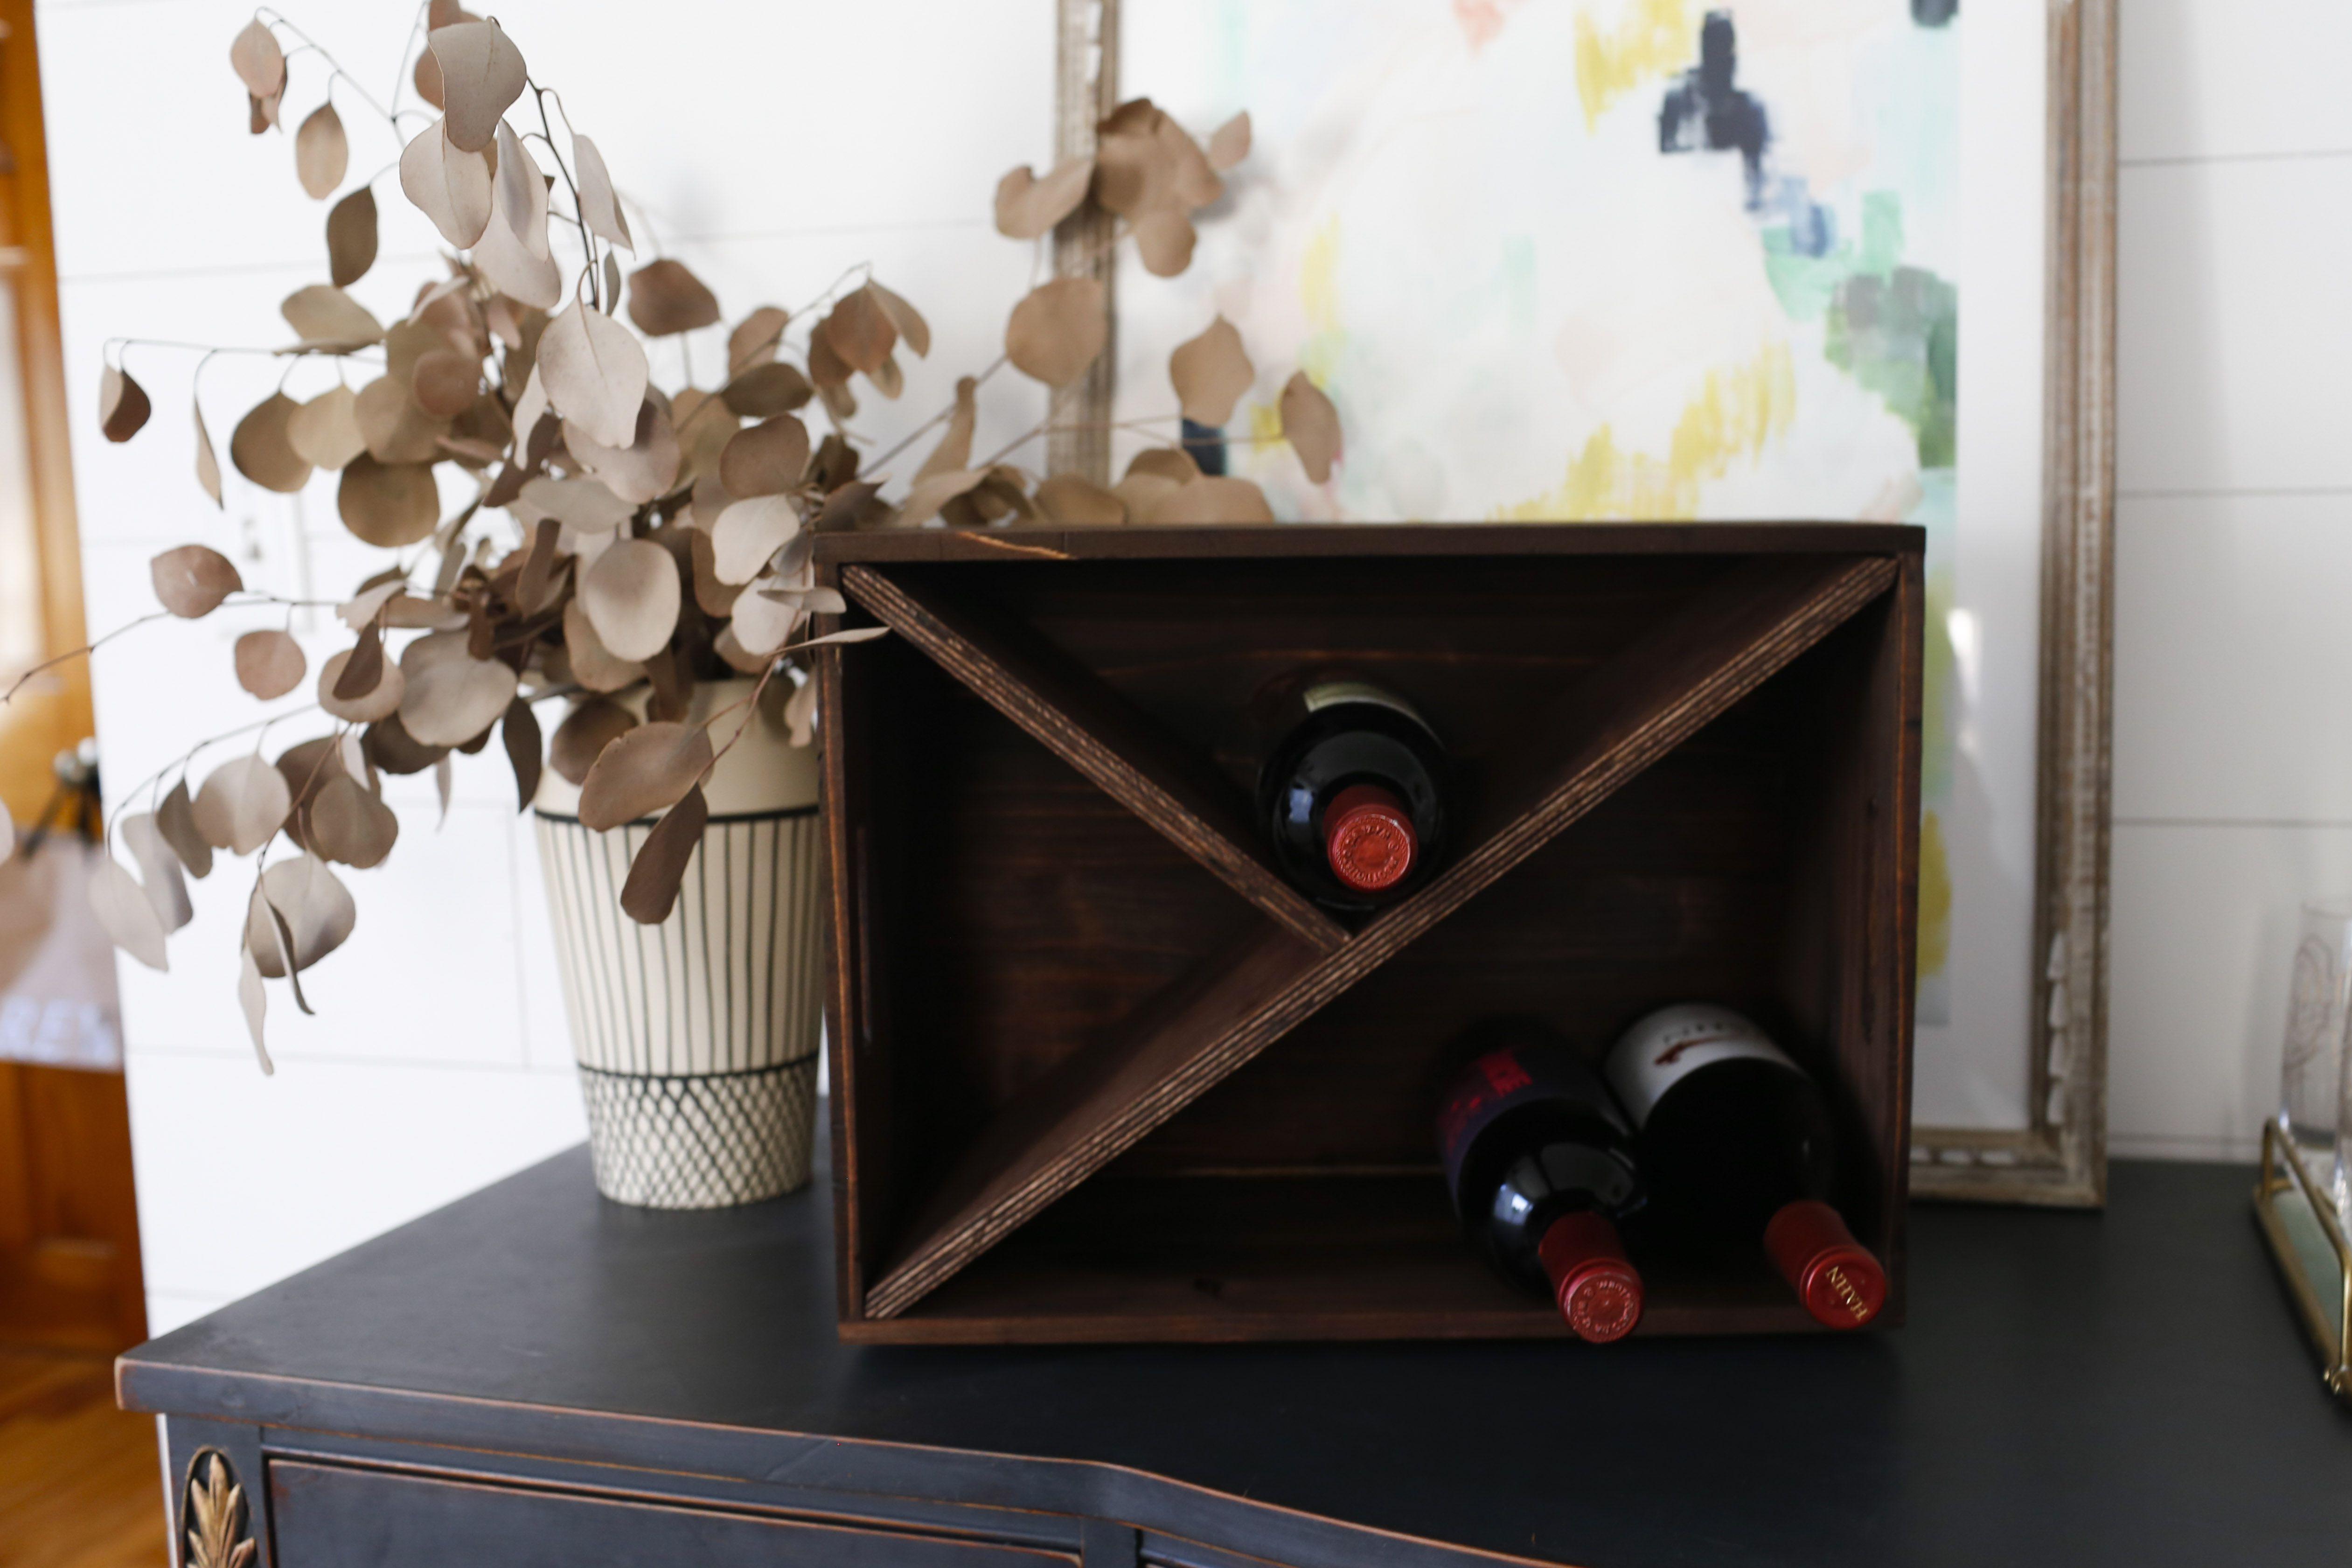 Astounding 10 Diy Wine Racks Anyone Can Make Download Free Architecture Designs Salvmadebymaigaardcom